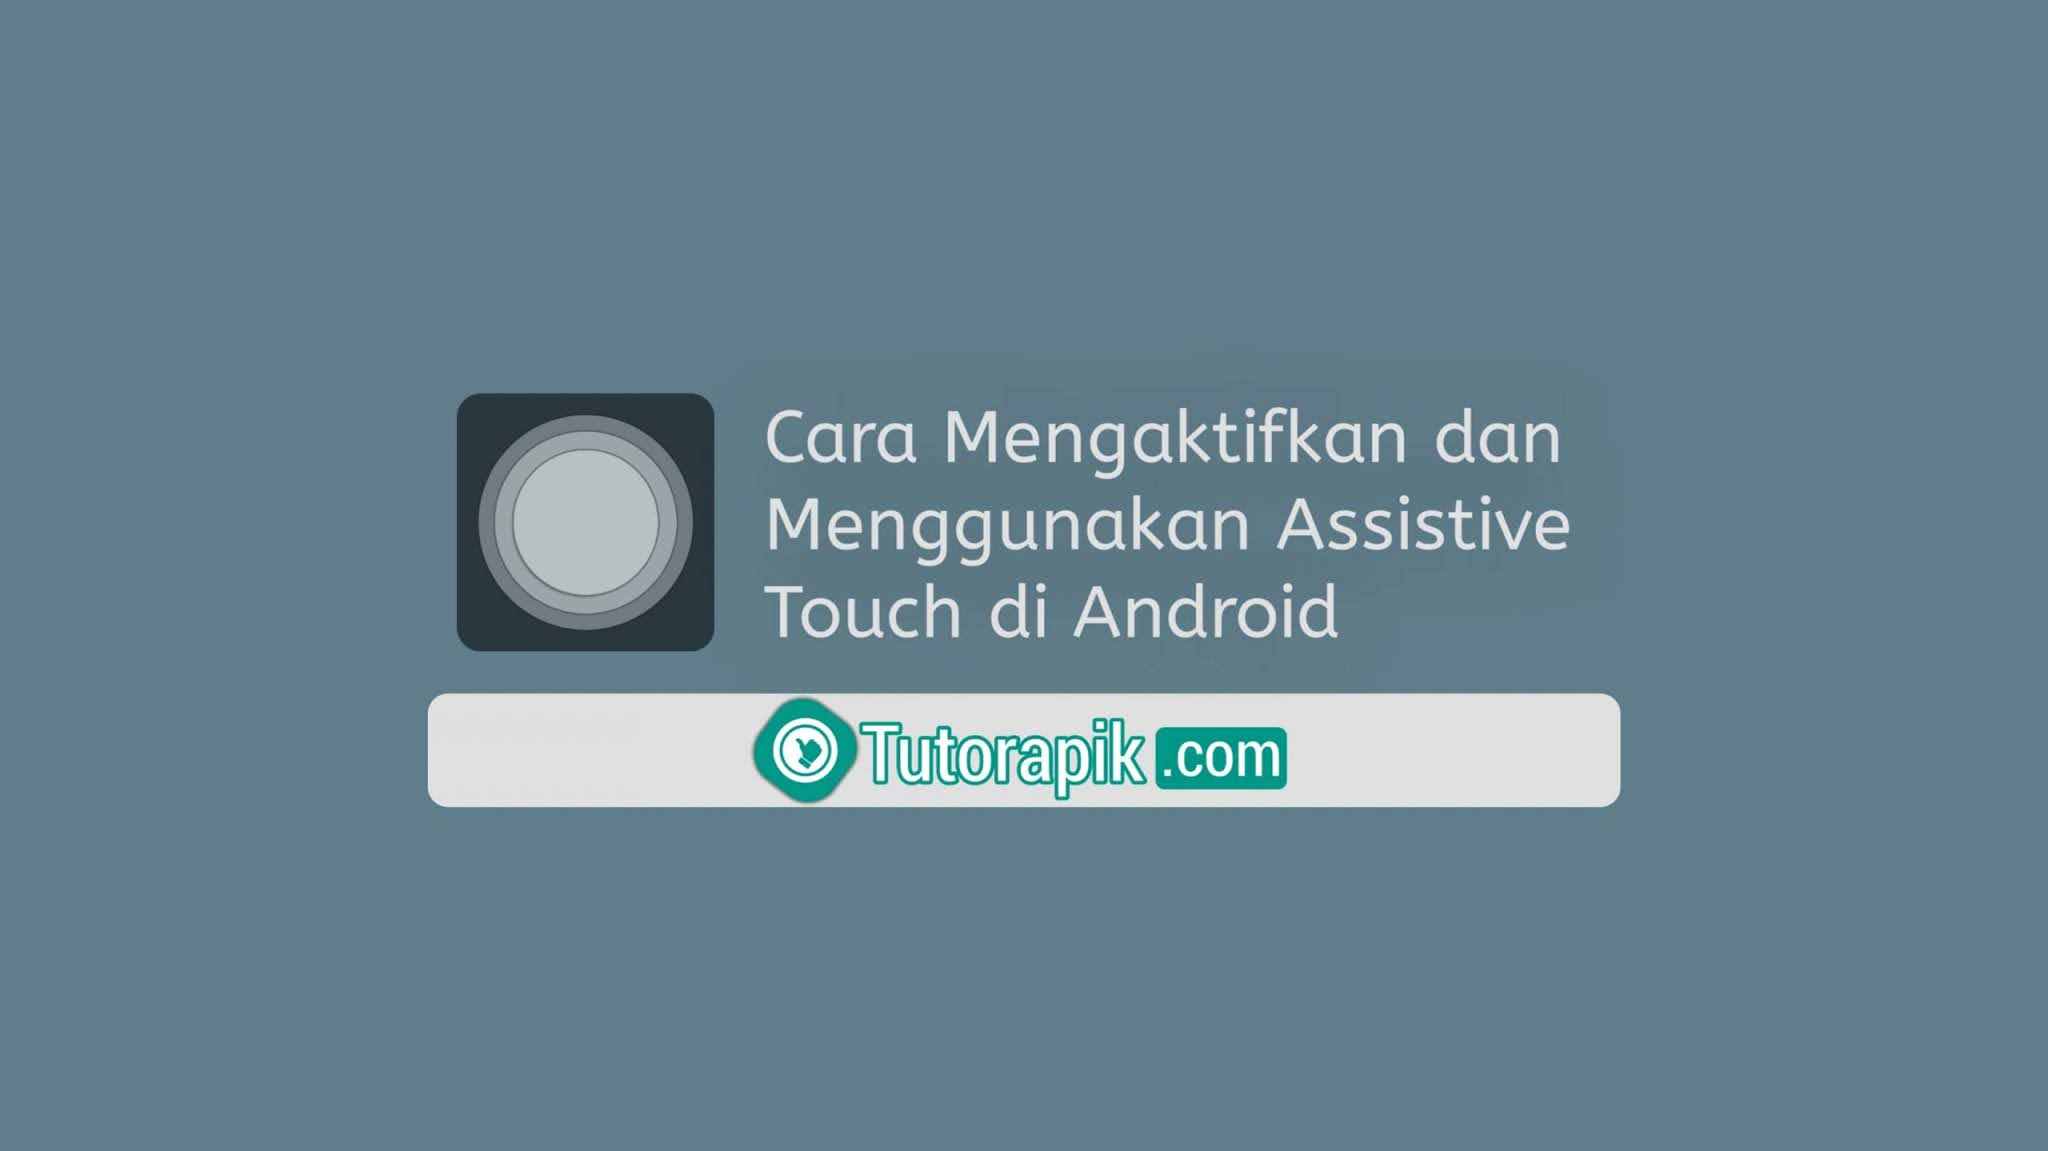 Cara Mengaktifkan dan menggunakan Assistive Touch di Android (Seperti iPhone)